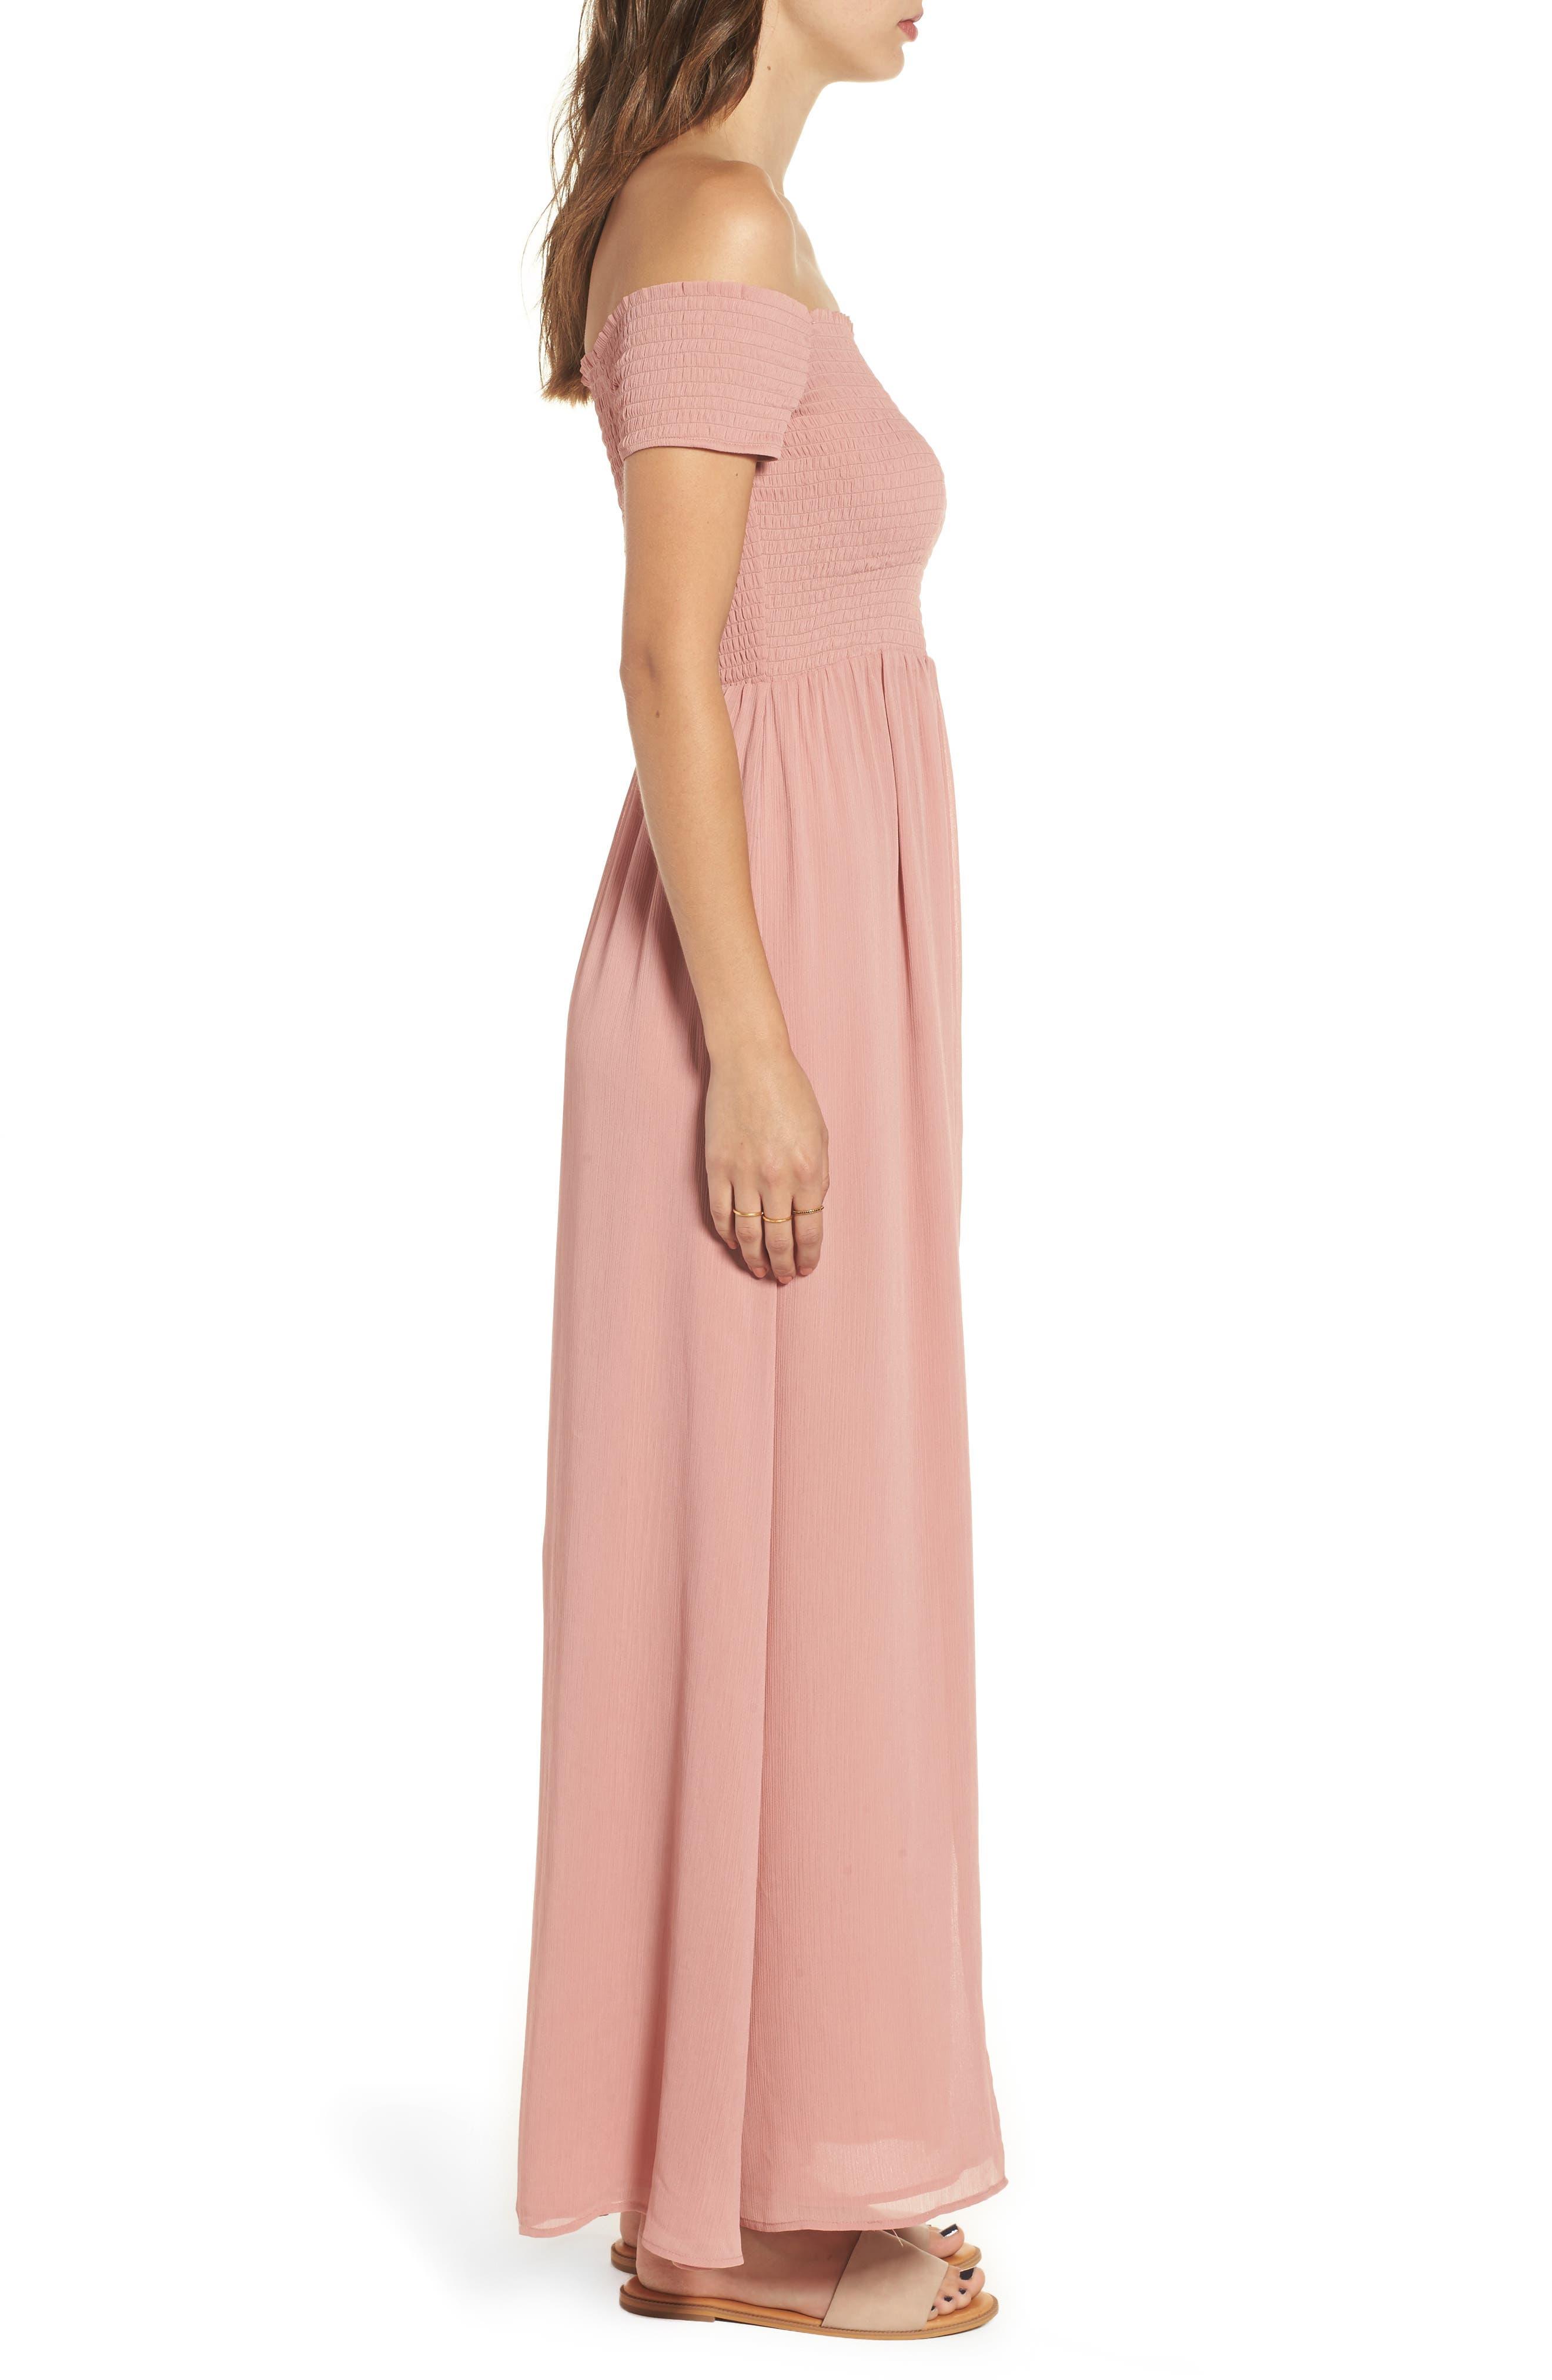 Henderson Print Off the Shoulder Maxi Dress,                             Alternate thumbnail 3, color,                             650